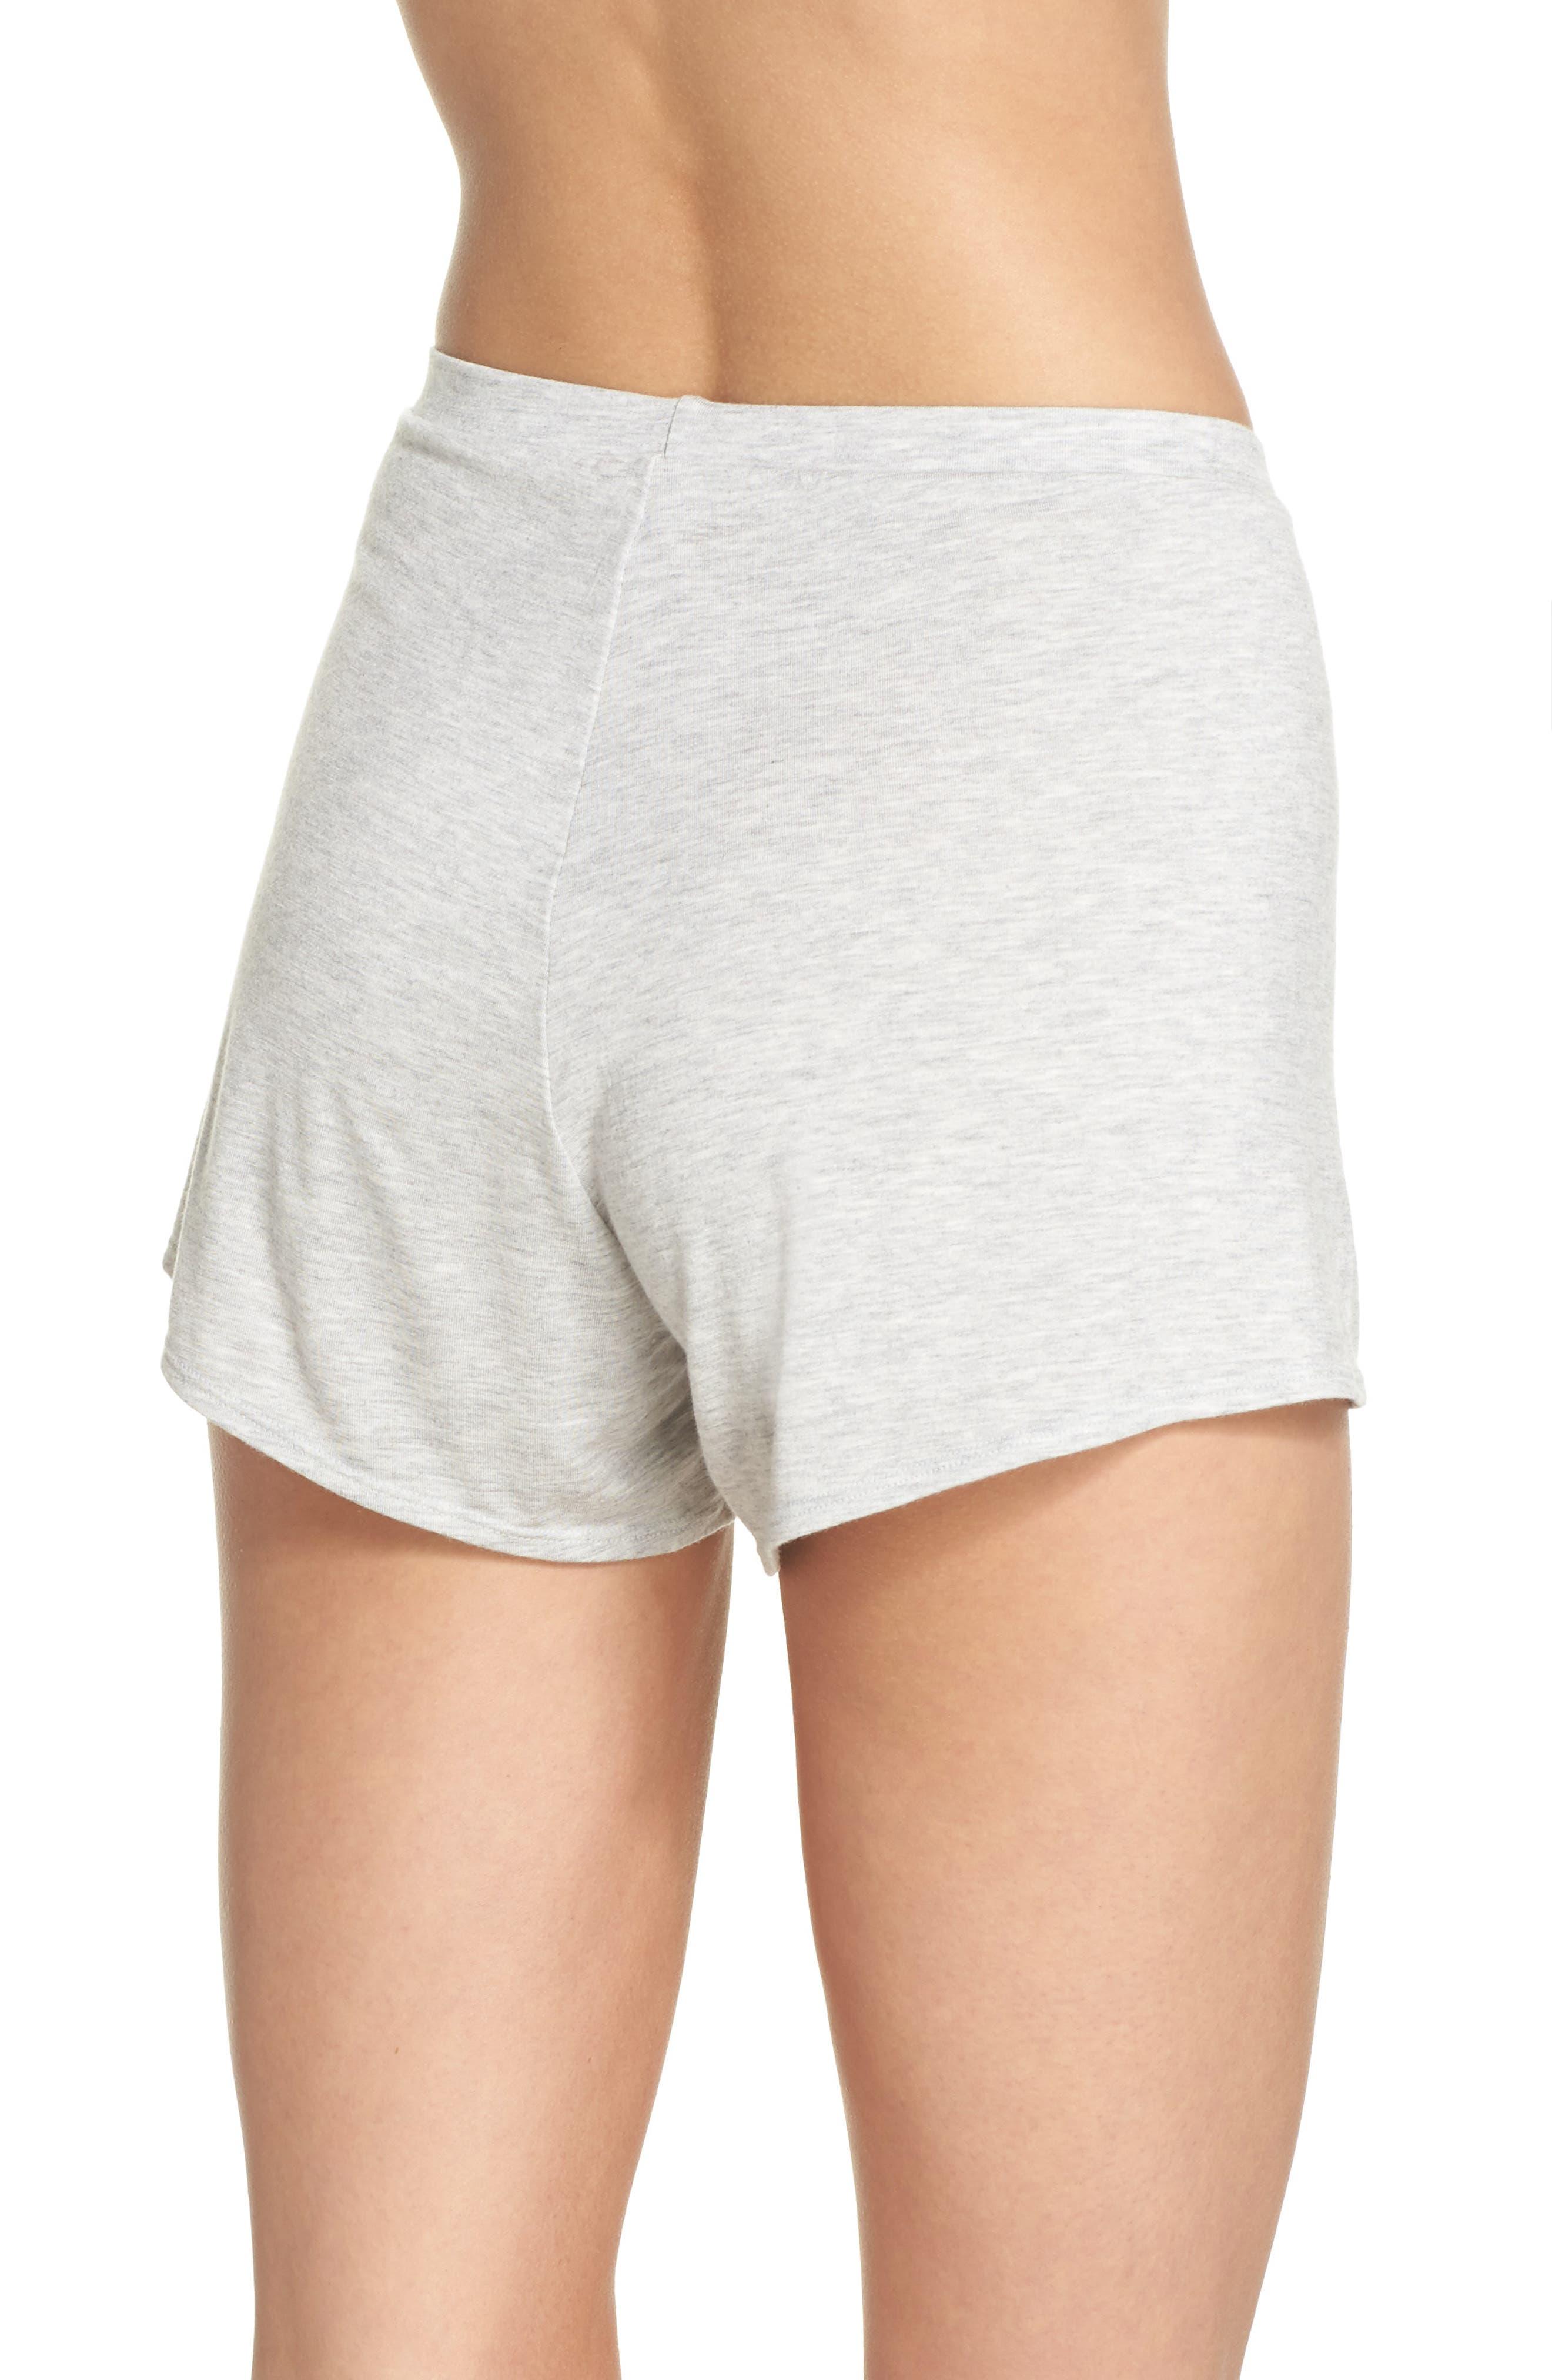 Undressed Pajama Shorts,                             Alternate thumbnail 4, color,